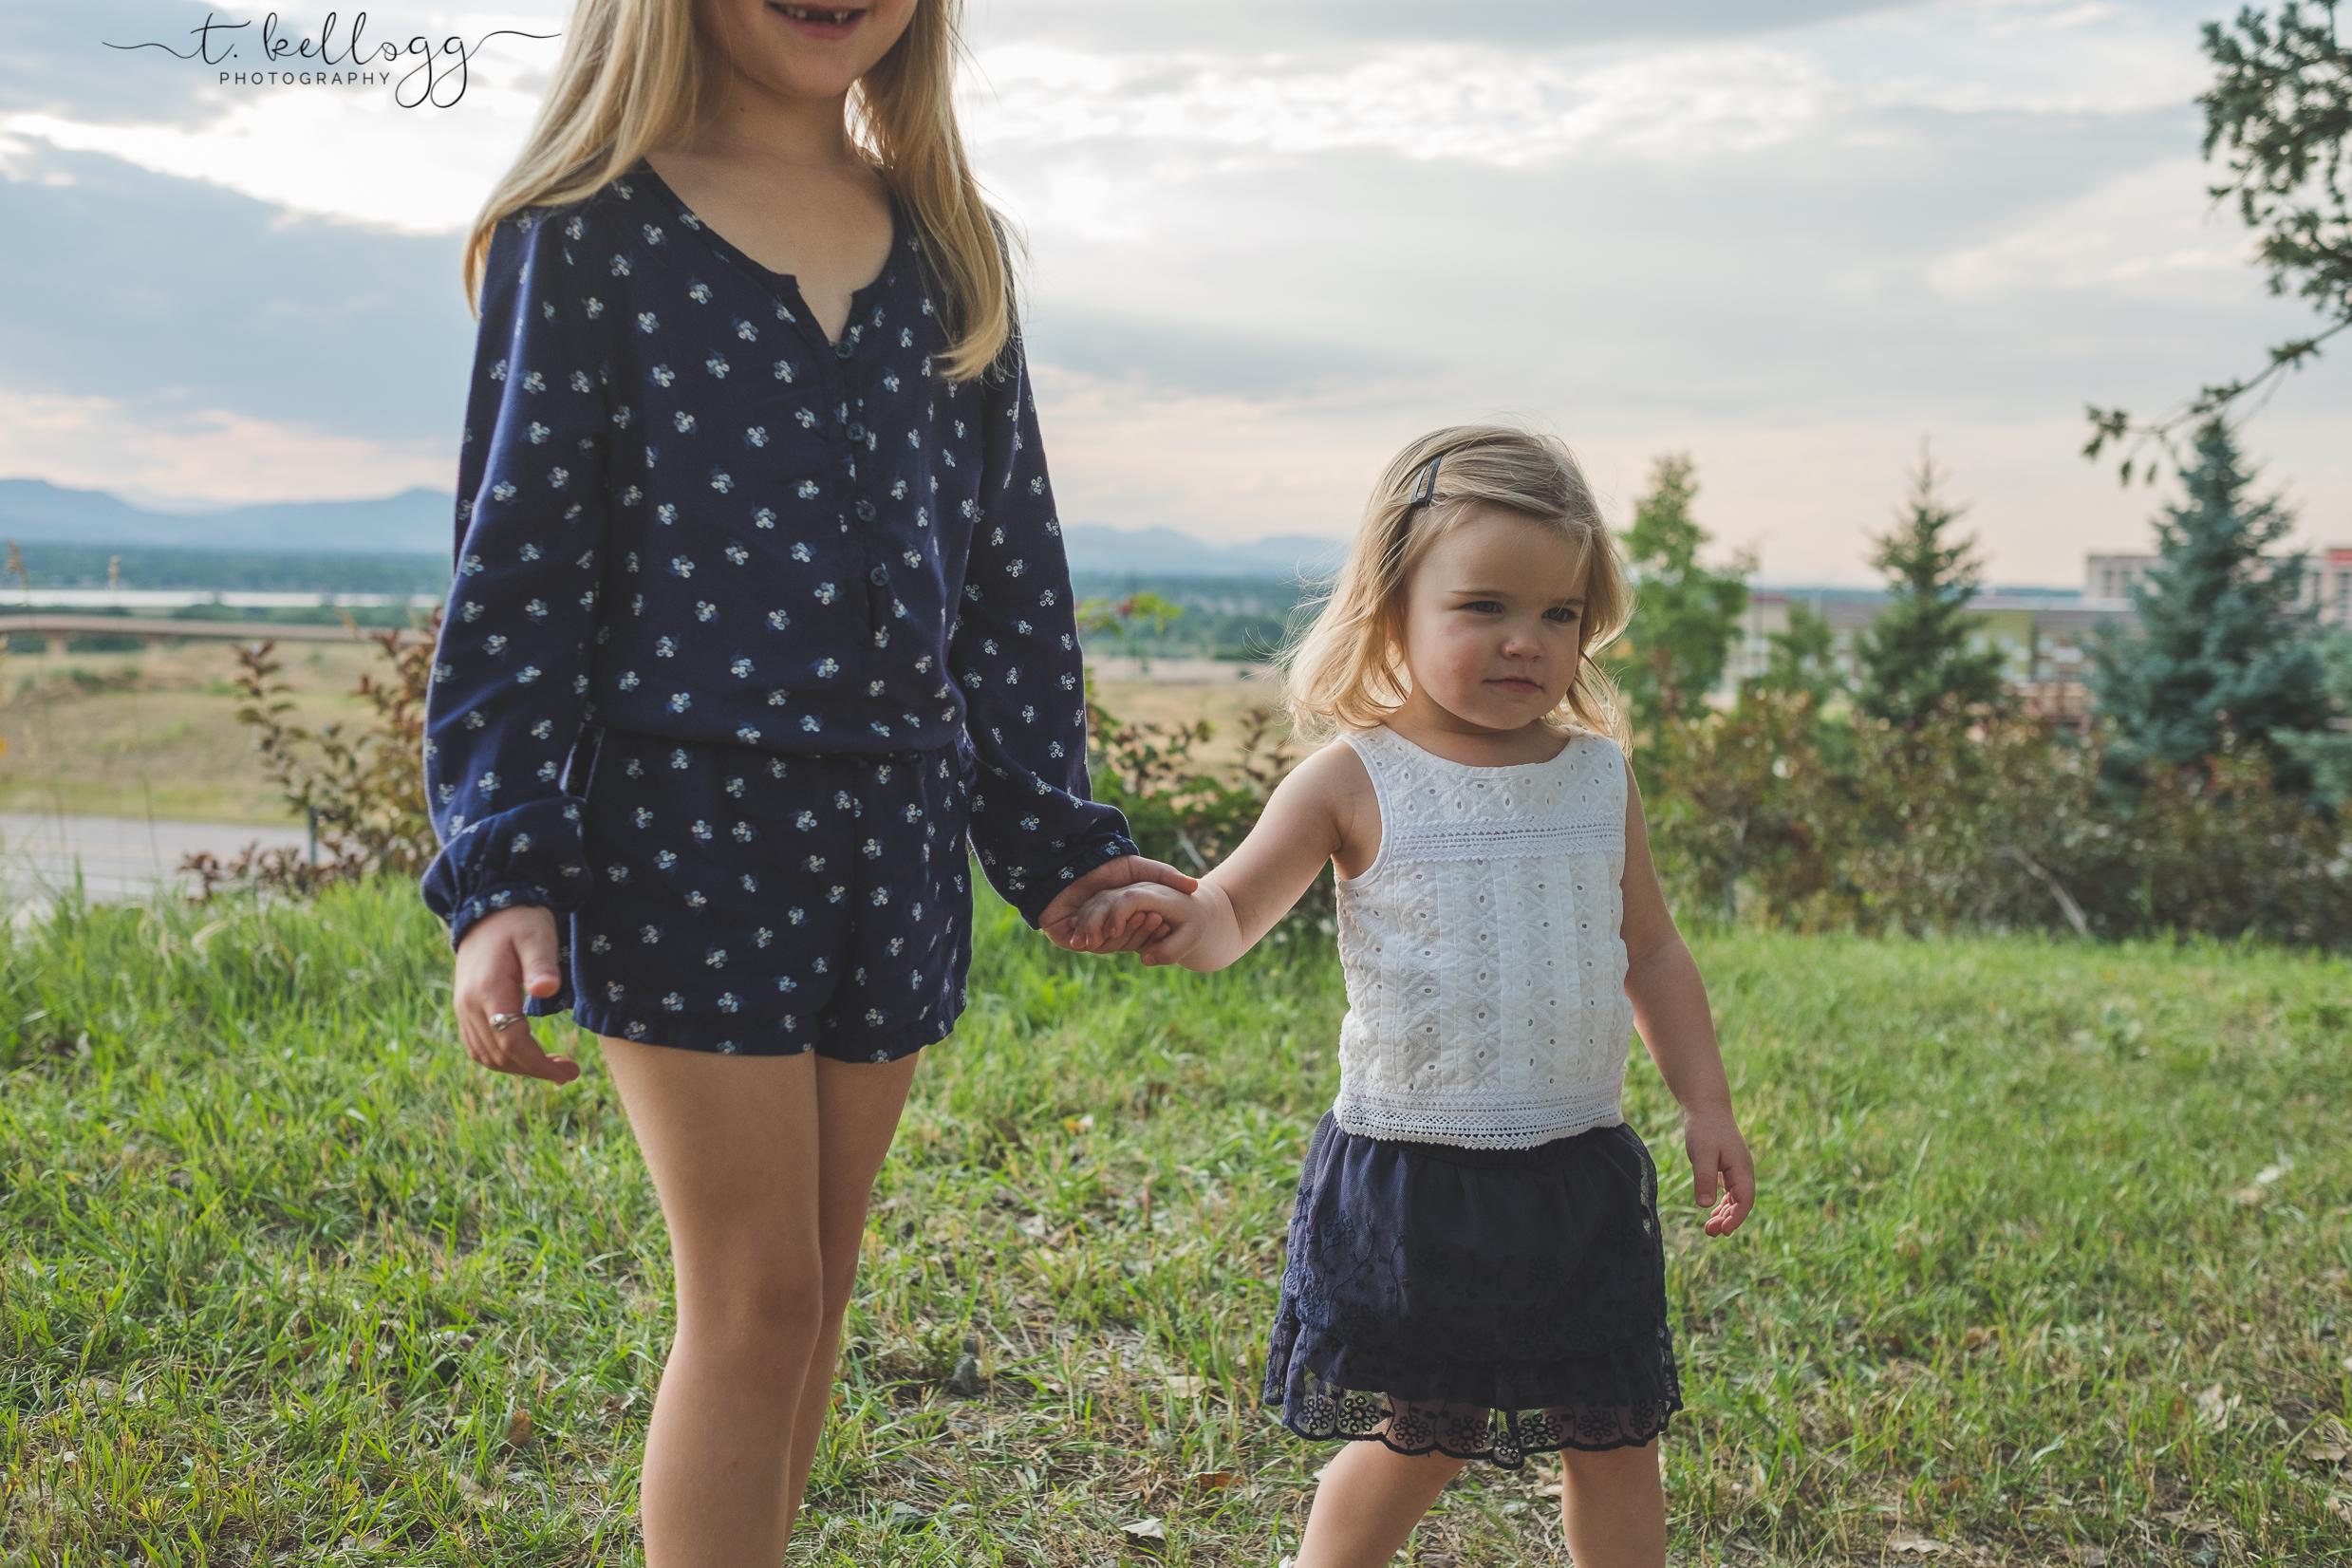 family-photographer-denver